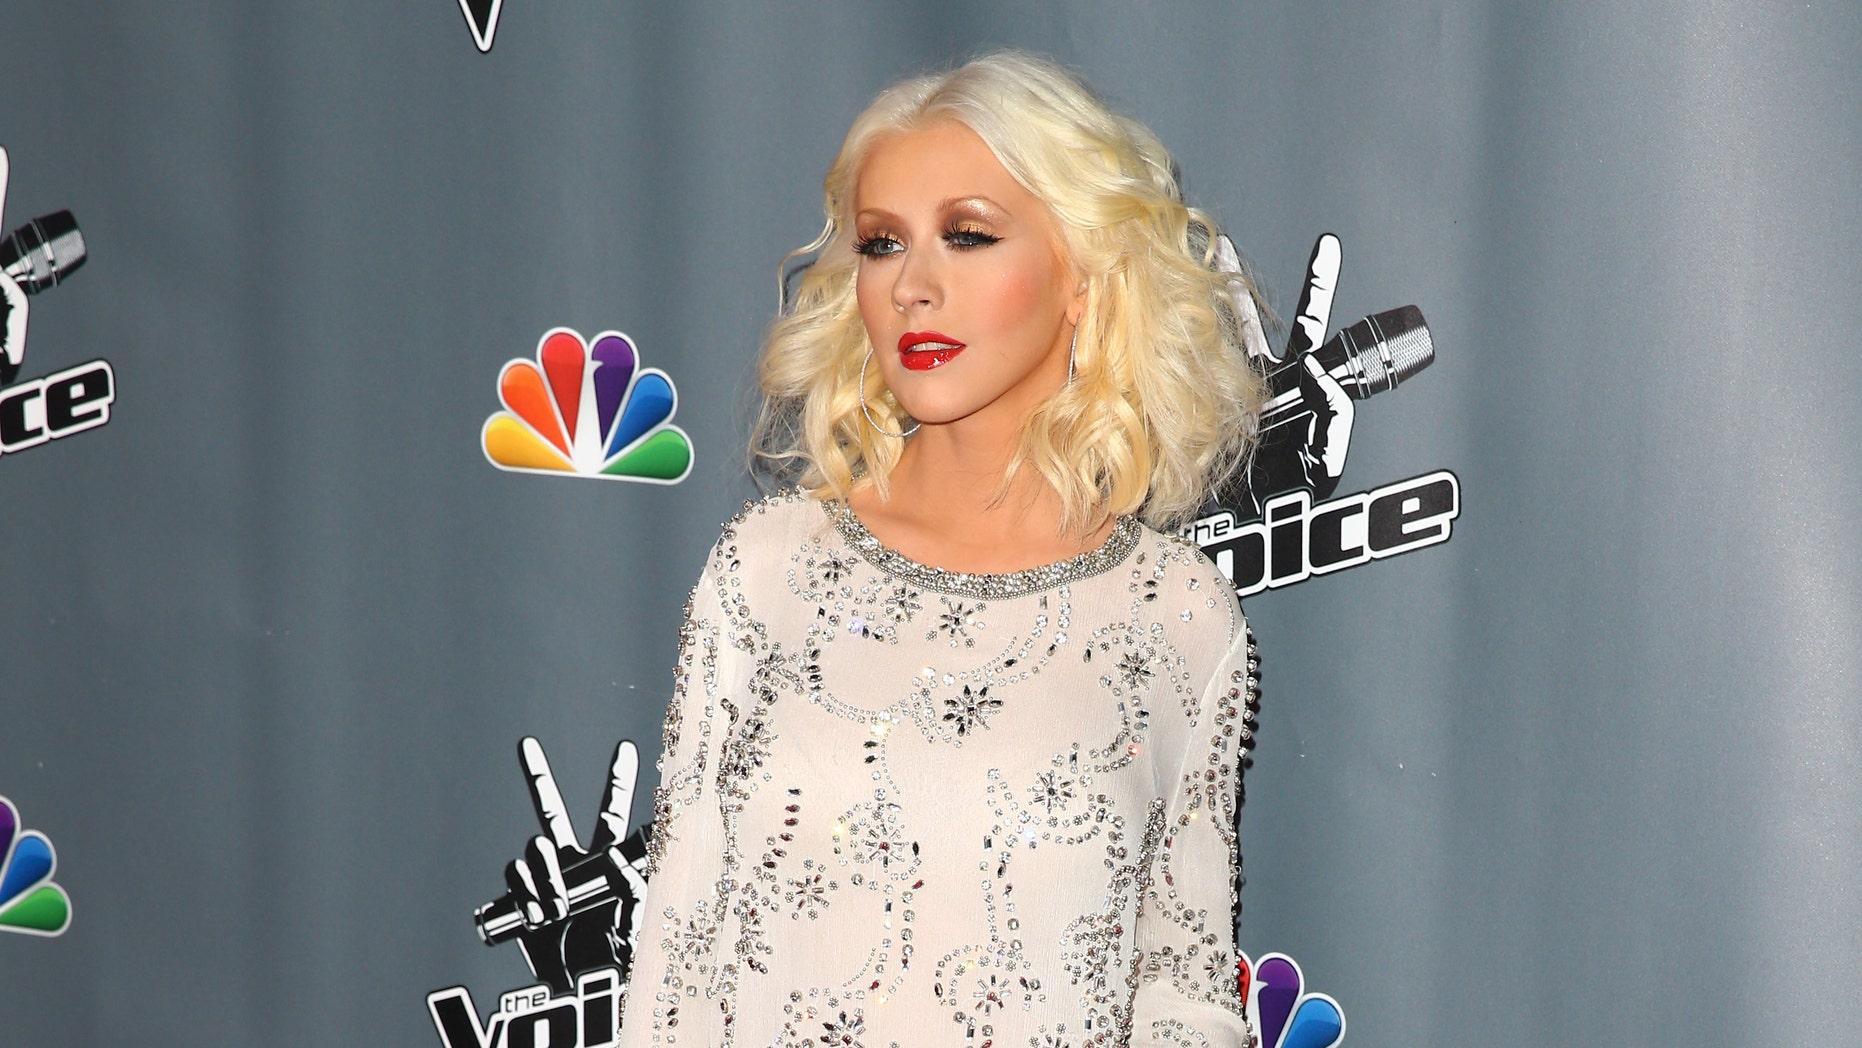 Fotos Christina Aguilera naked (43 photos), Pussy, Hot, Boobs, butt 2018